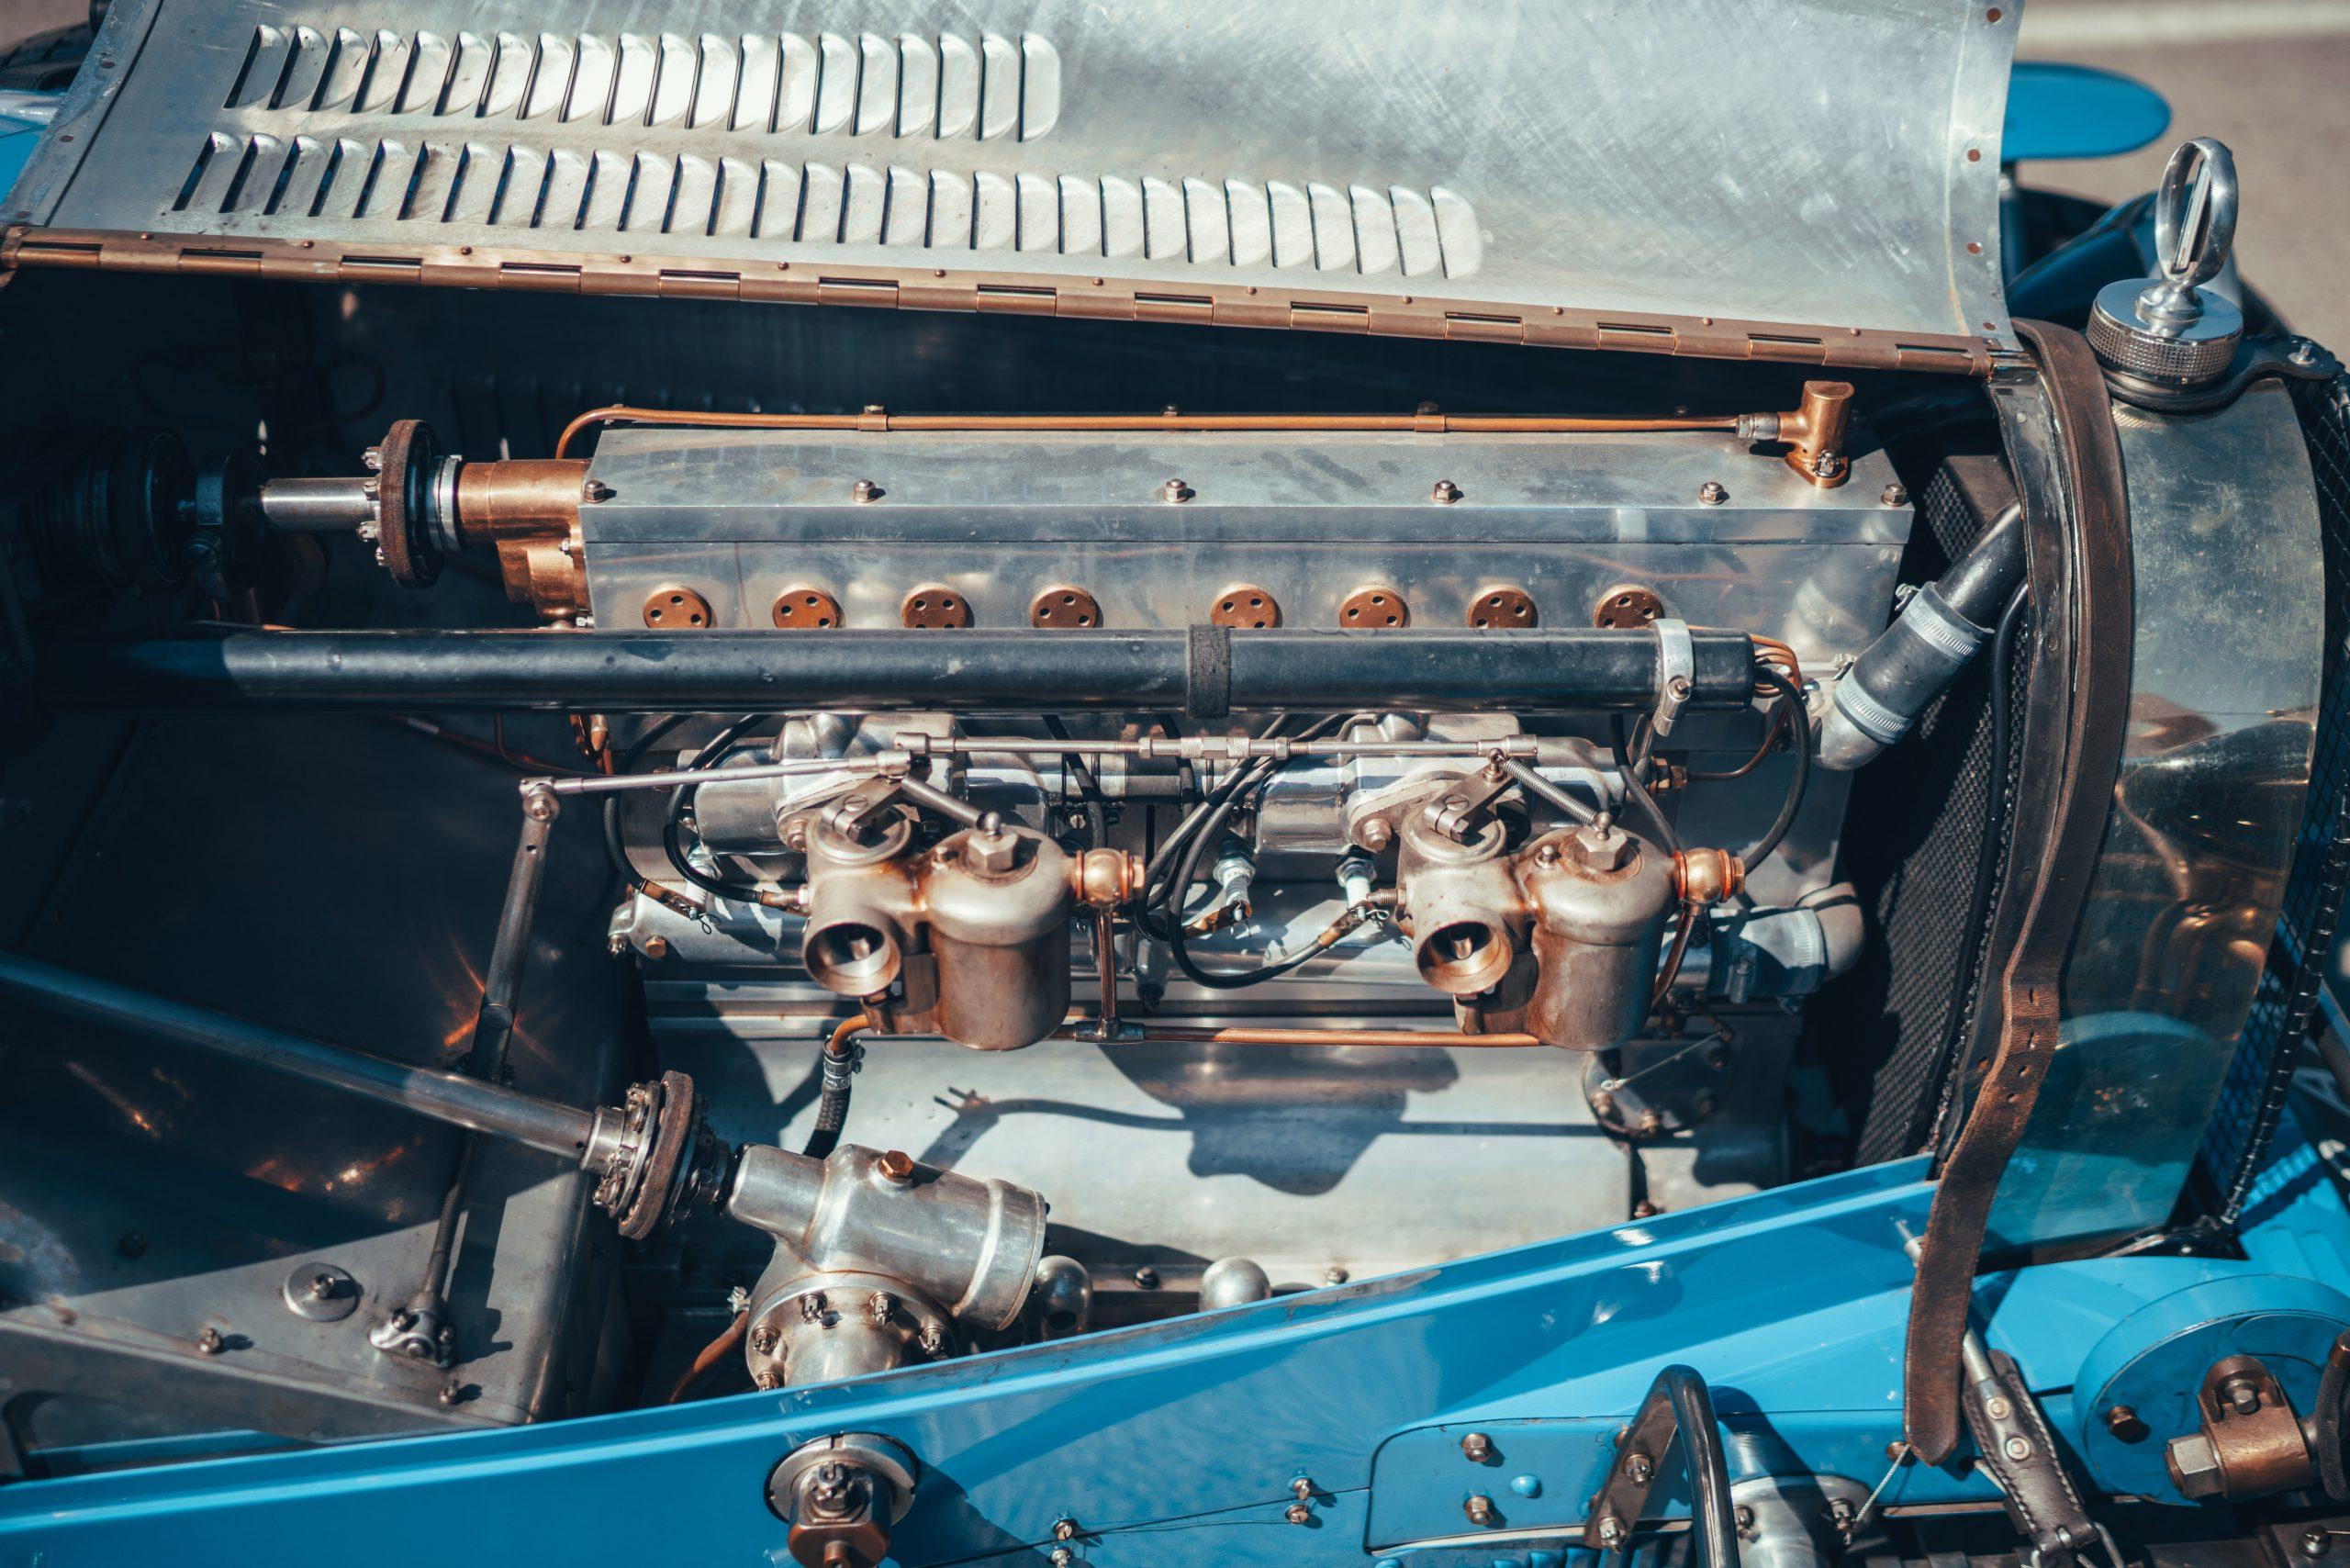 Targa Florio Bugatti Type 35 race car prewar vintage motorsports engine